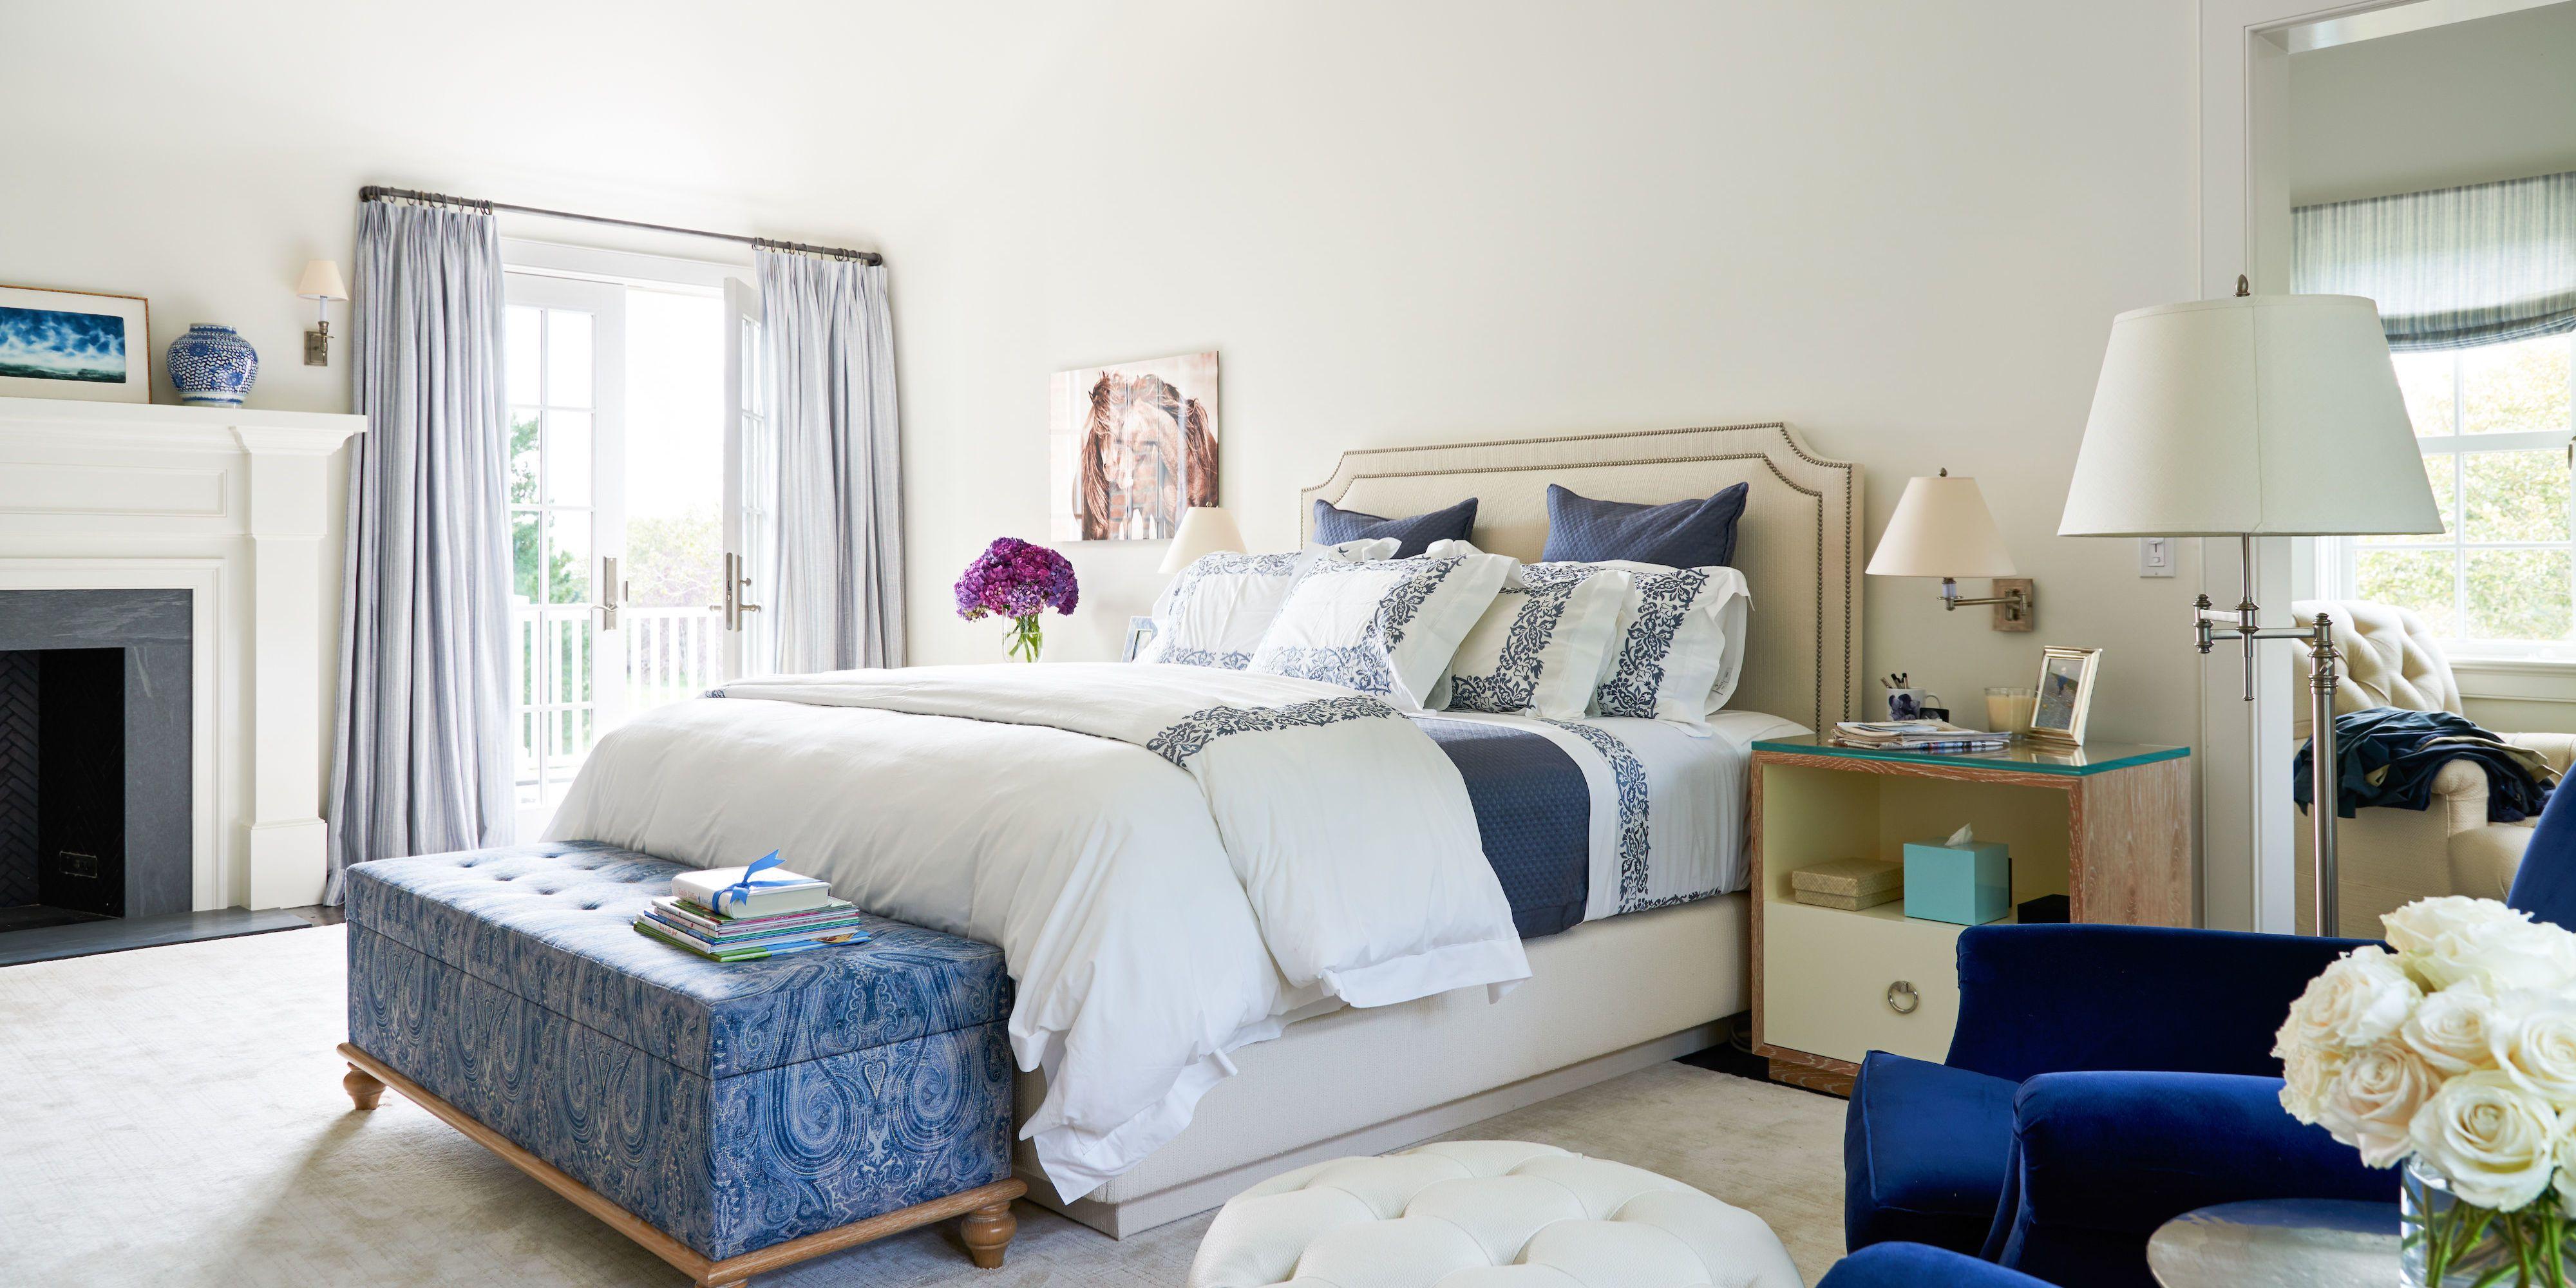 alec baldwin h&tons home master bedroom & 25 Best Bedroom Decor Tips - How To Decorate A Bedroom